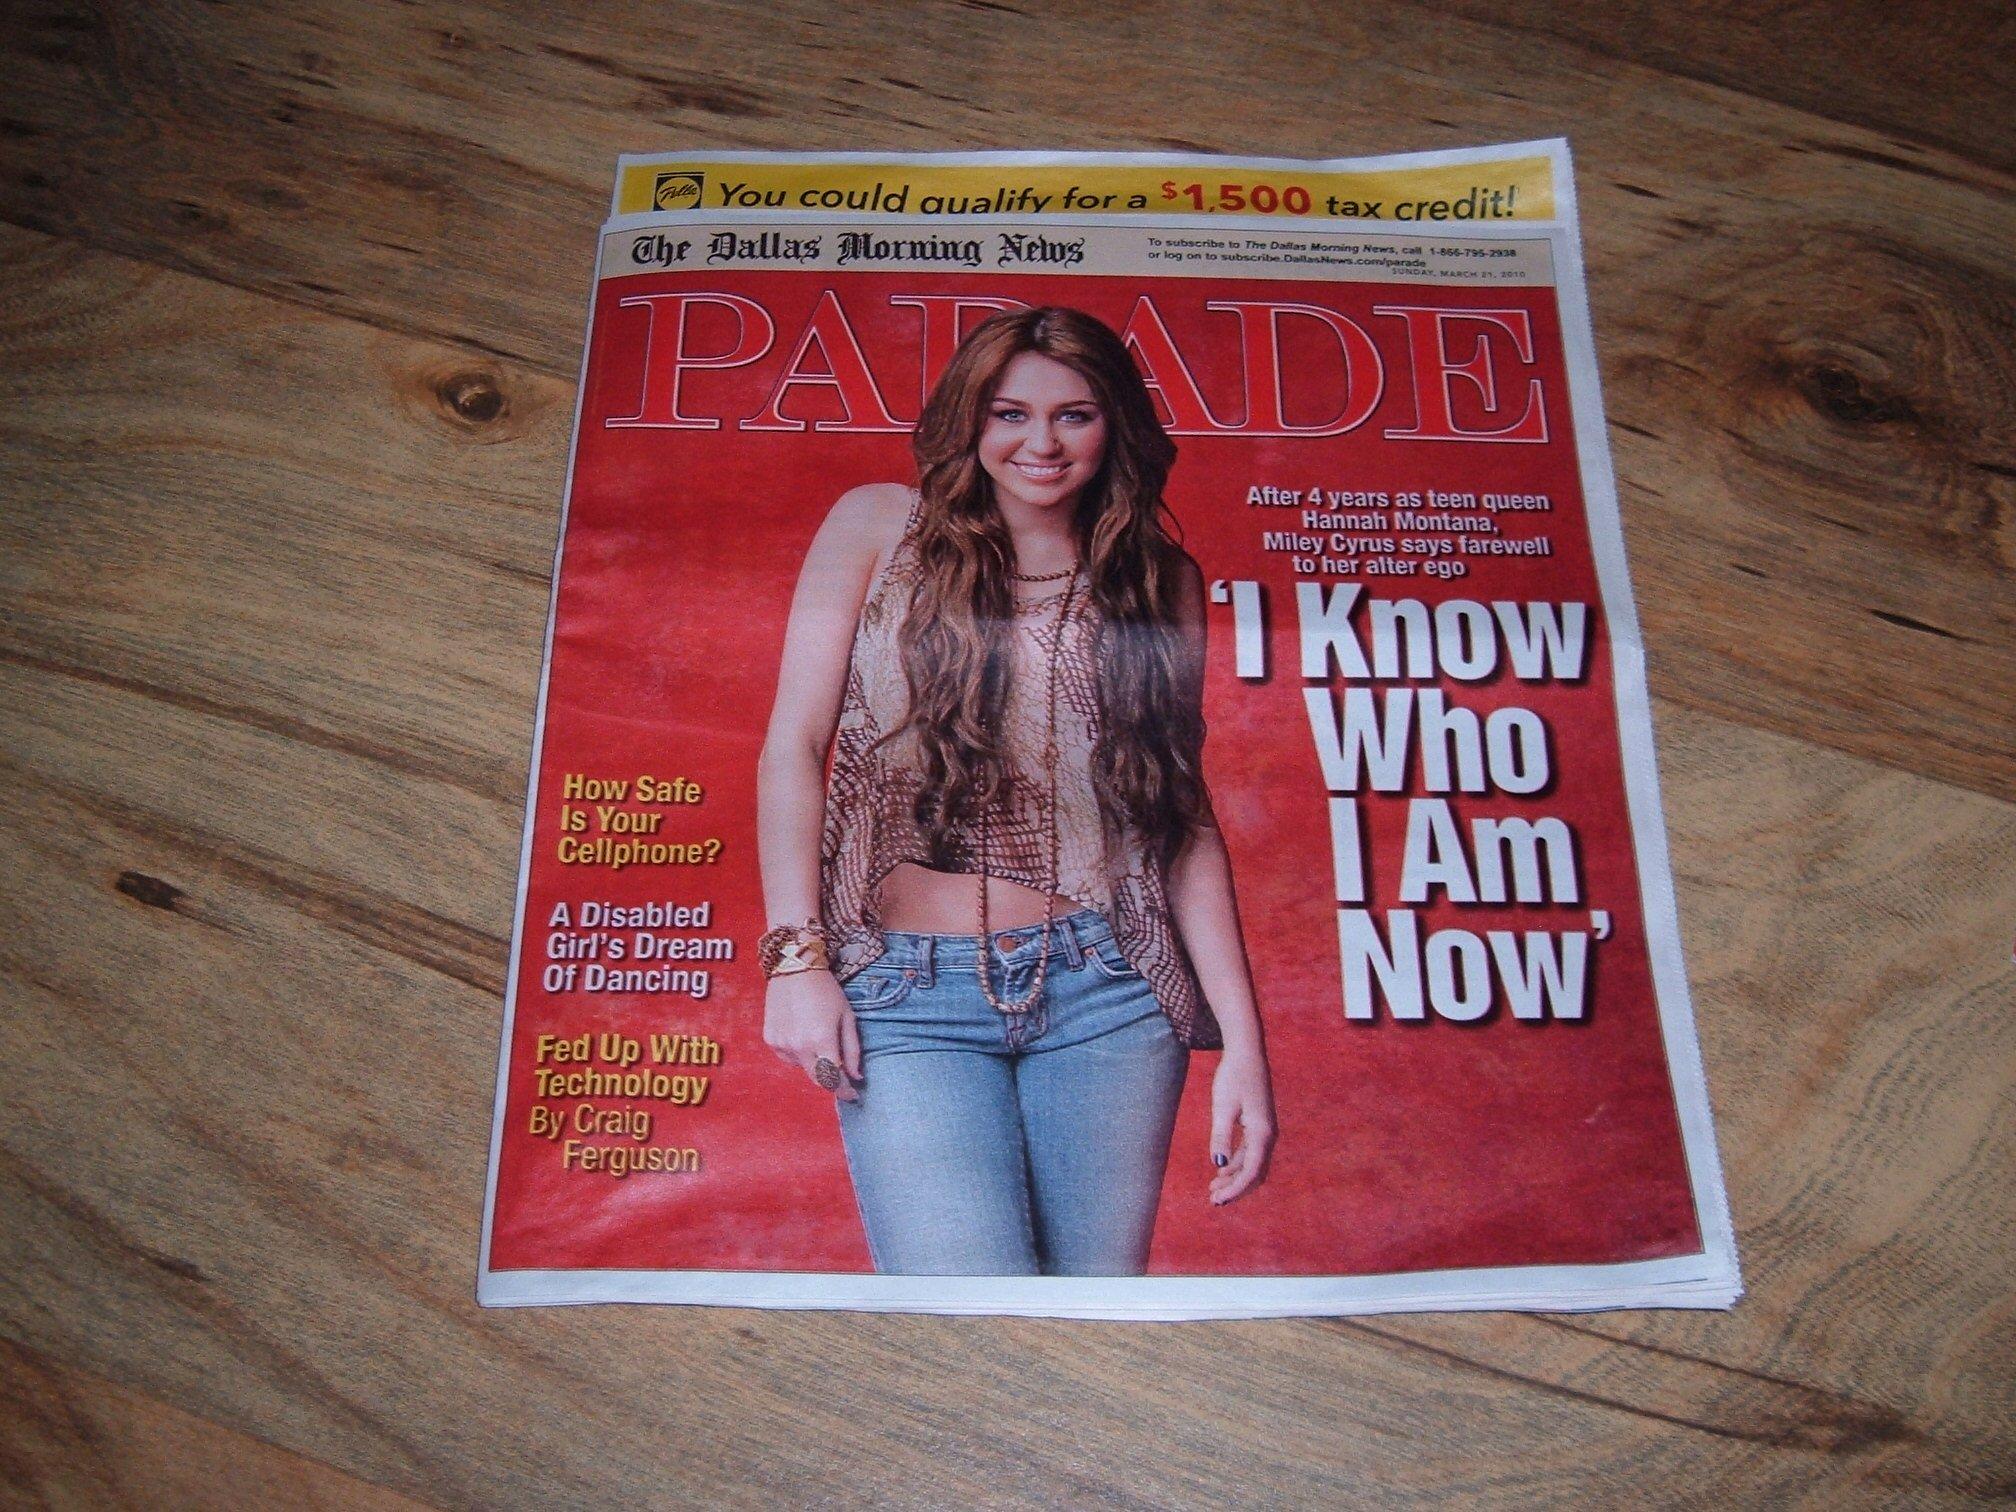 Parade Magazine (Parade newspaper insert from the Lexington